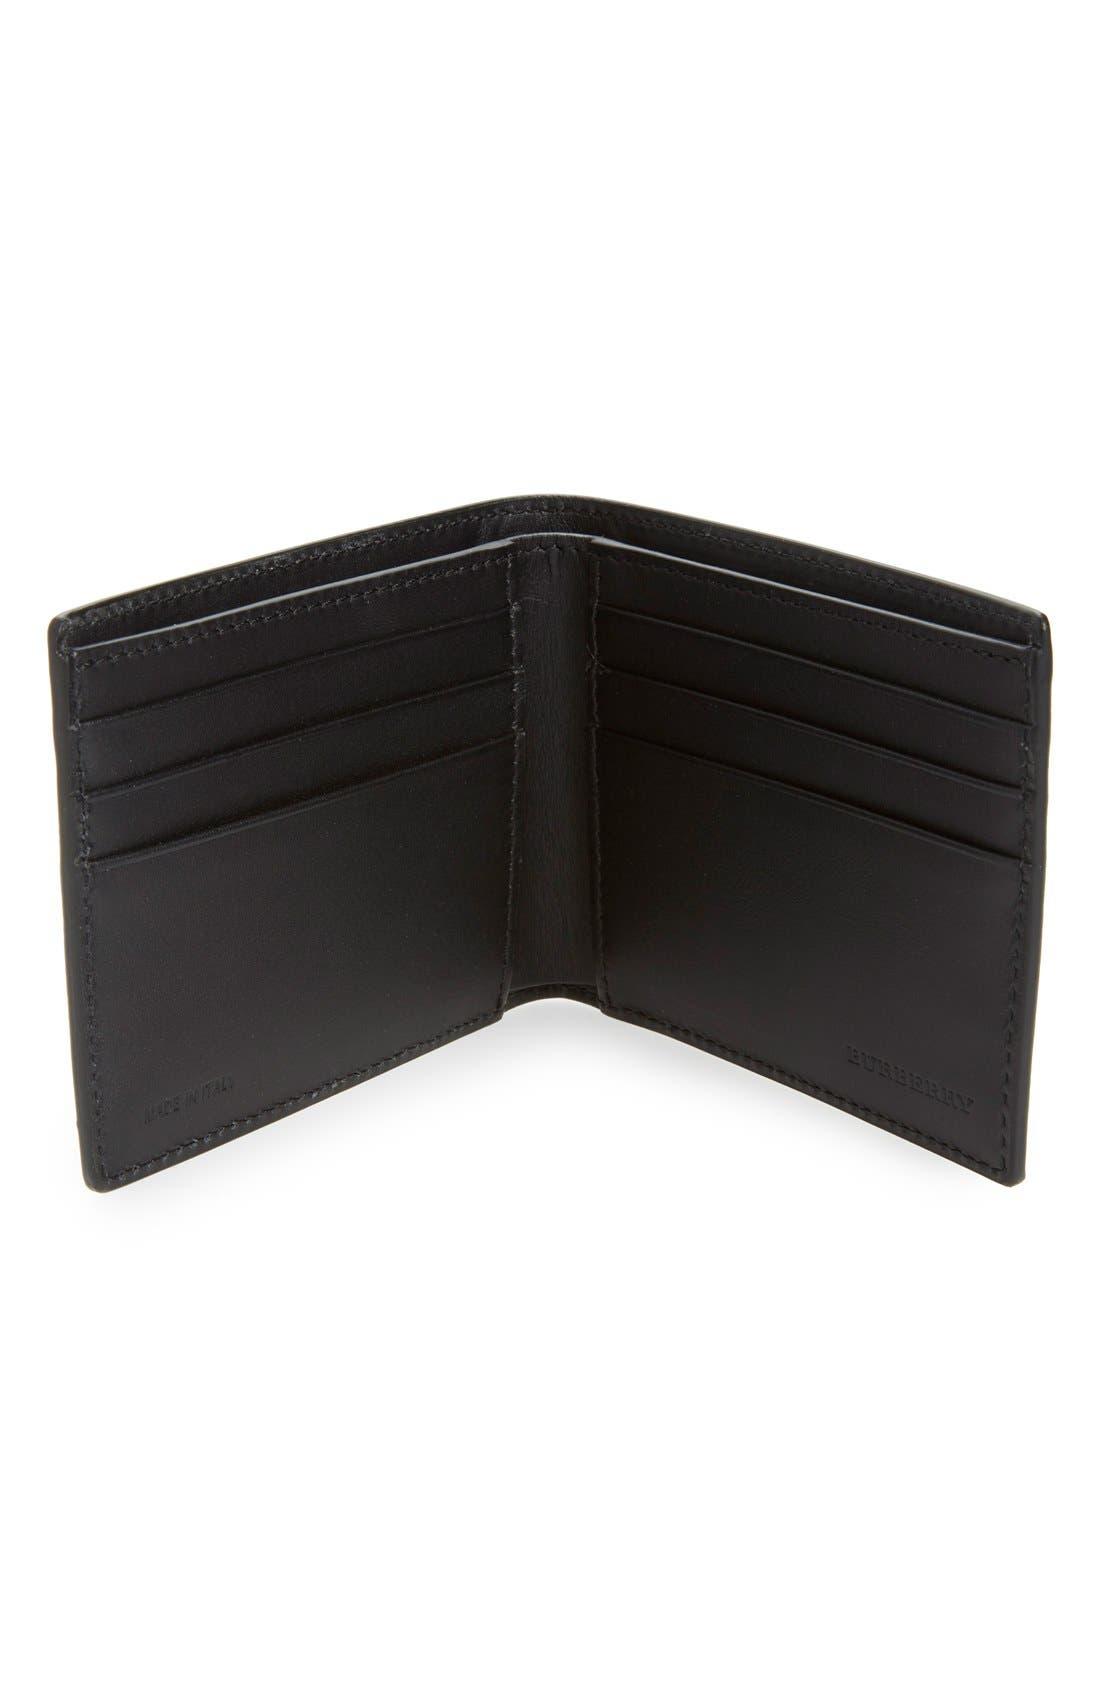 'New London' Calfskin Leather Bifold Wallet,                             Alternate thumbnail 3, color,                             001